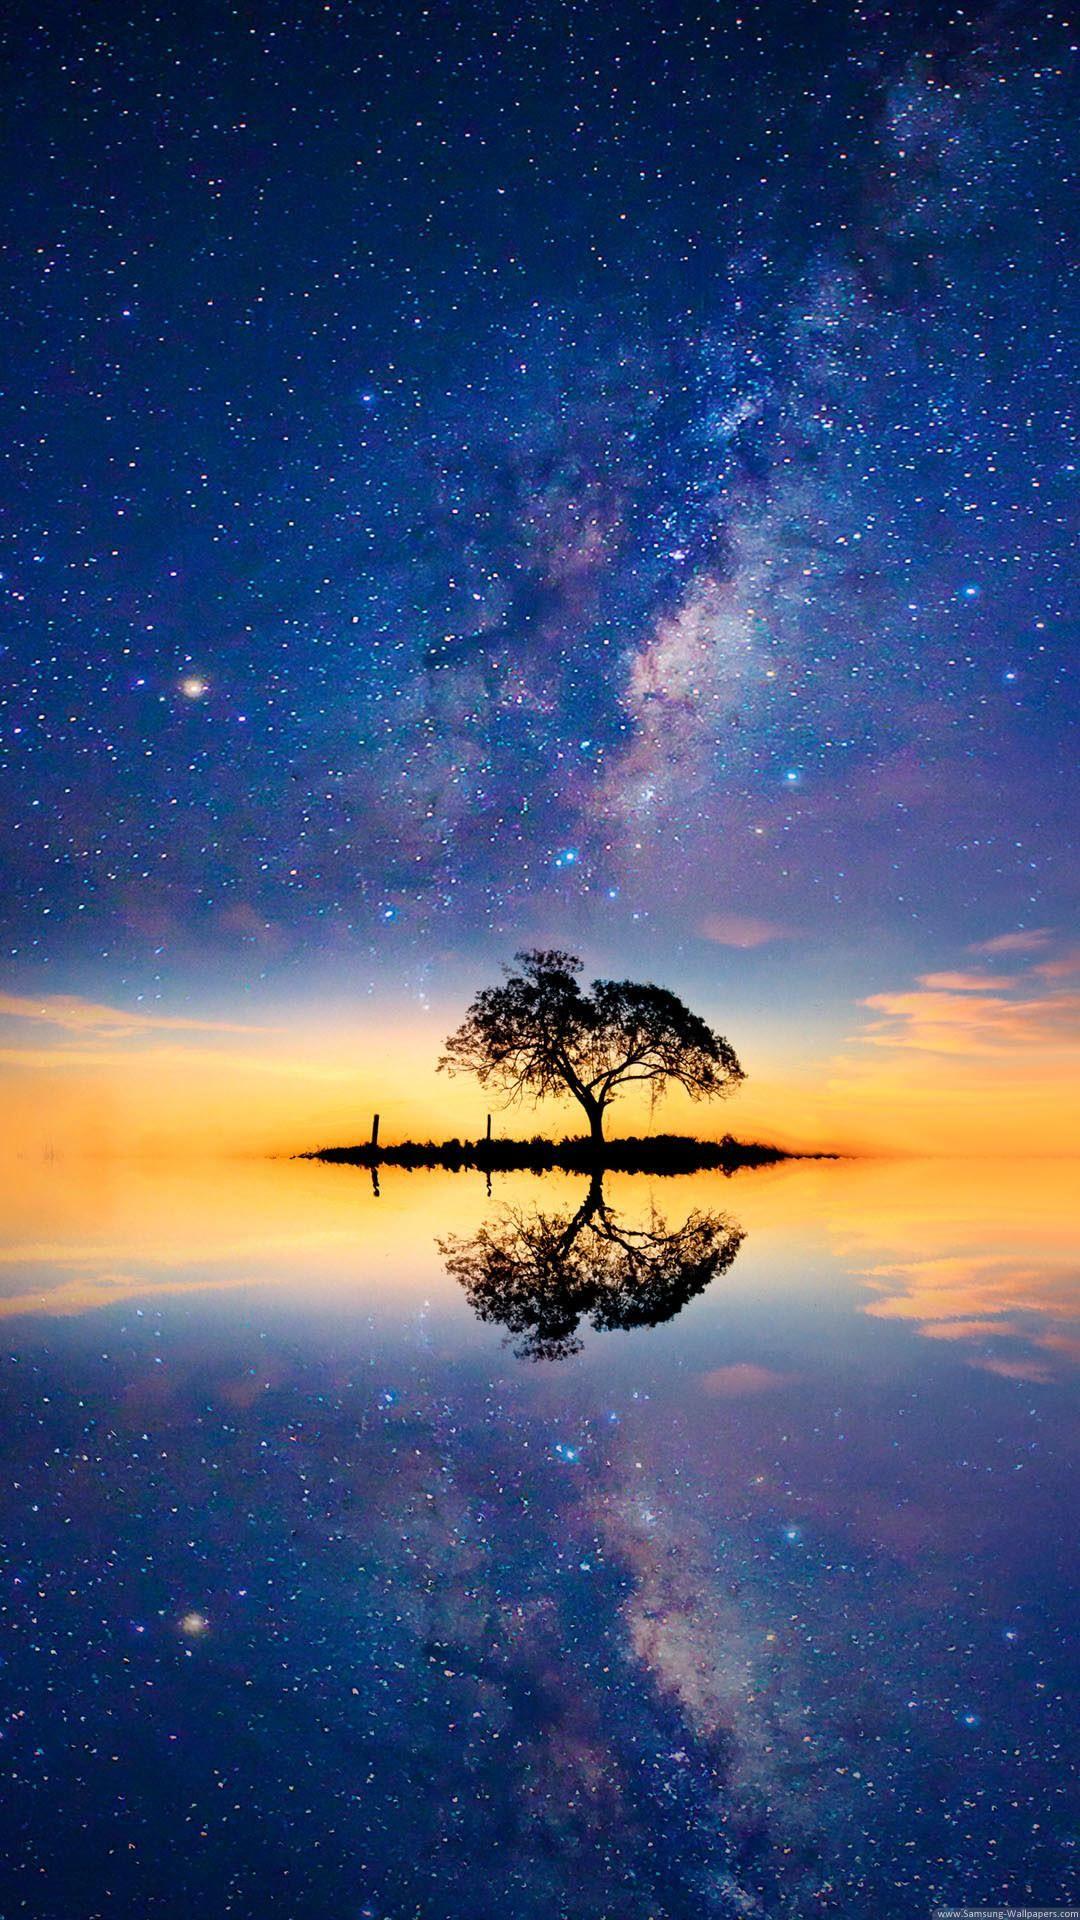 Galaxy Wallpaper Download in 2020 Iphone wallpaper sky